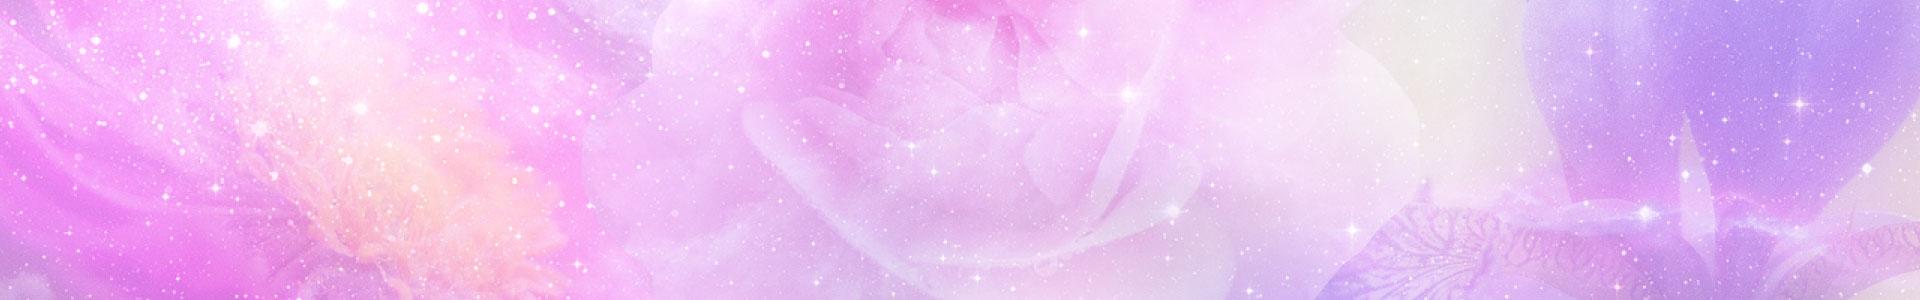 flowers-stars-banner-1920x300px